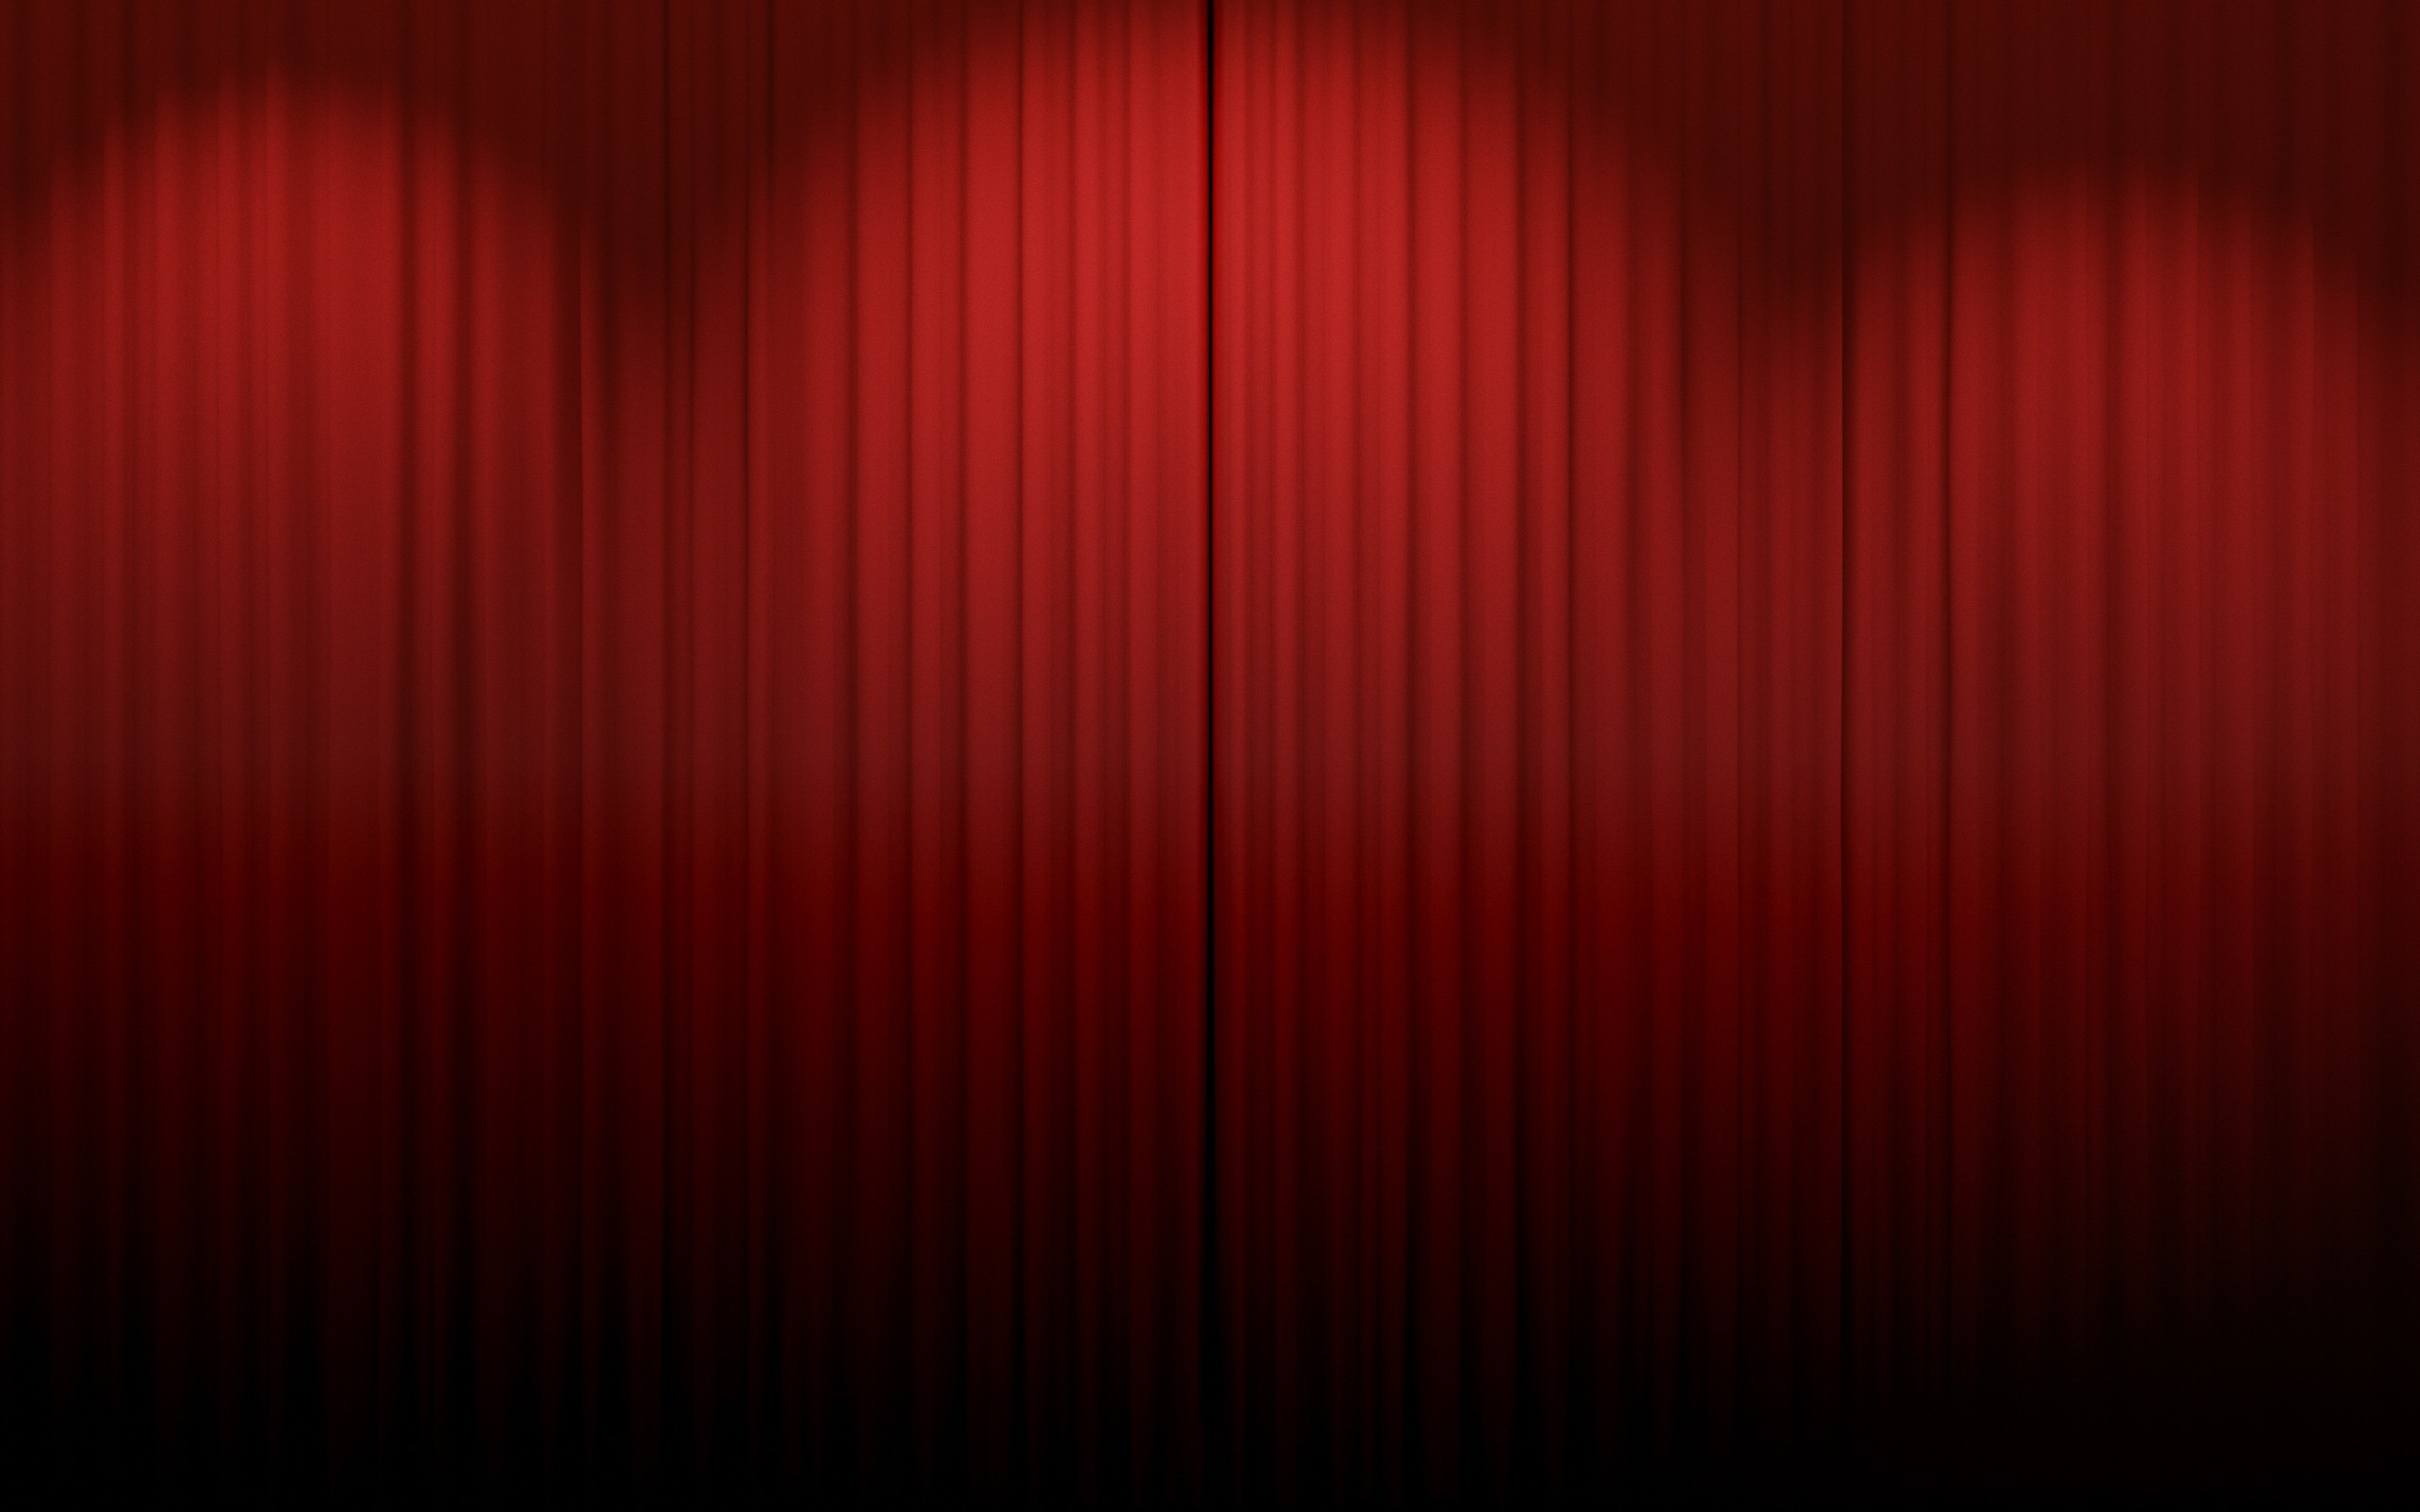 Stage curtain wallpaper wallpapersafari - Pin Red Curtains Wallpaper 2560x1600 Theatre Scenario On Pinterest